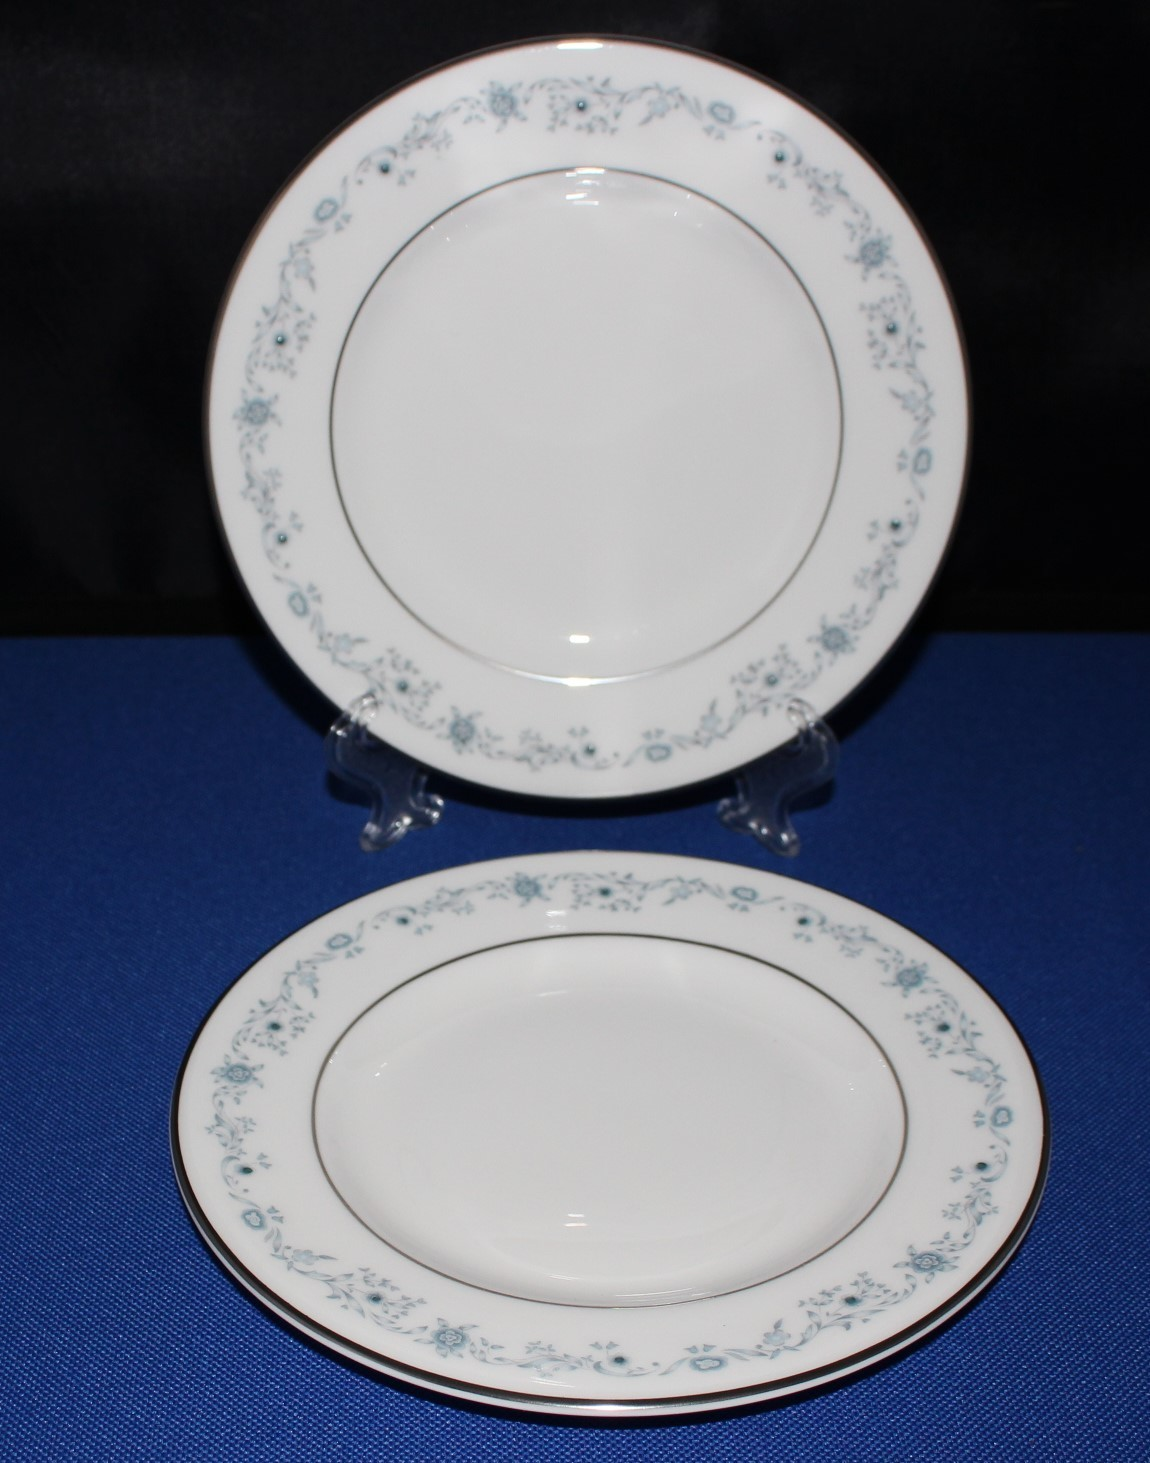 Set of 2 Royal Doulton Angelique H4997 Bread Plates Blue Floral Fine Bone China